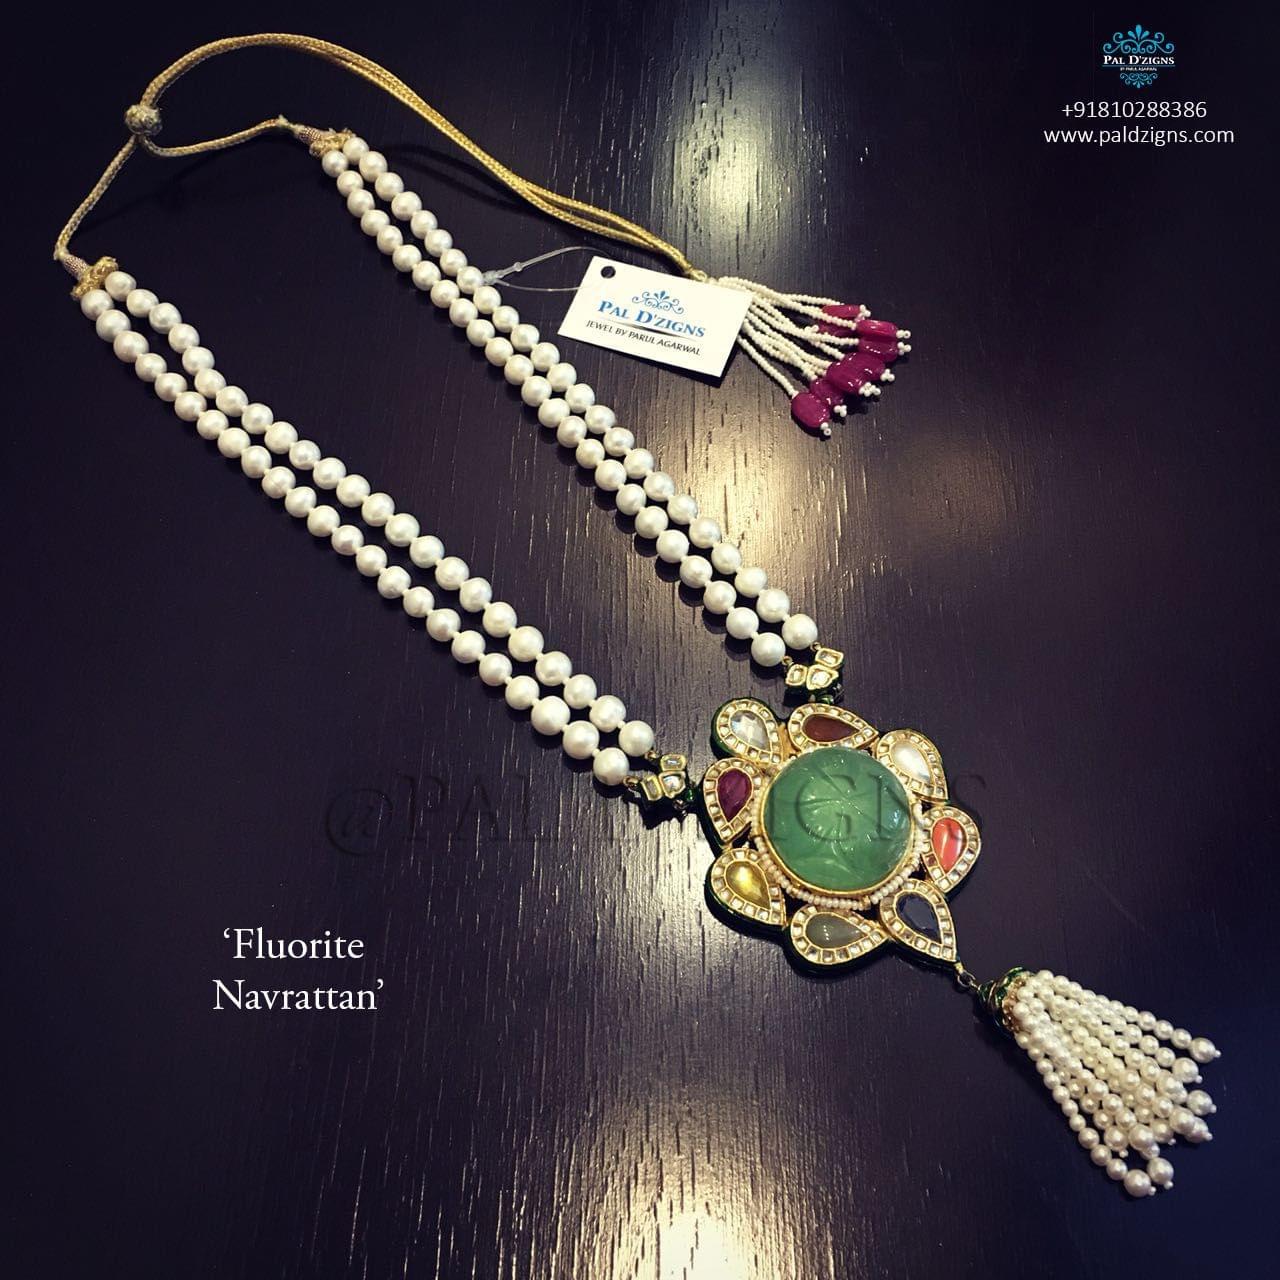 Fluorite Navrattan Kundan Necklace